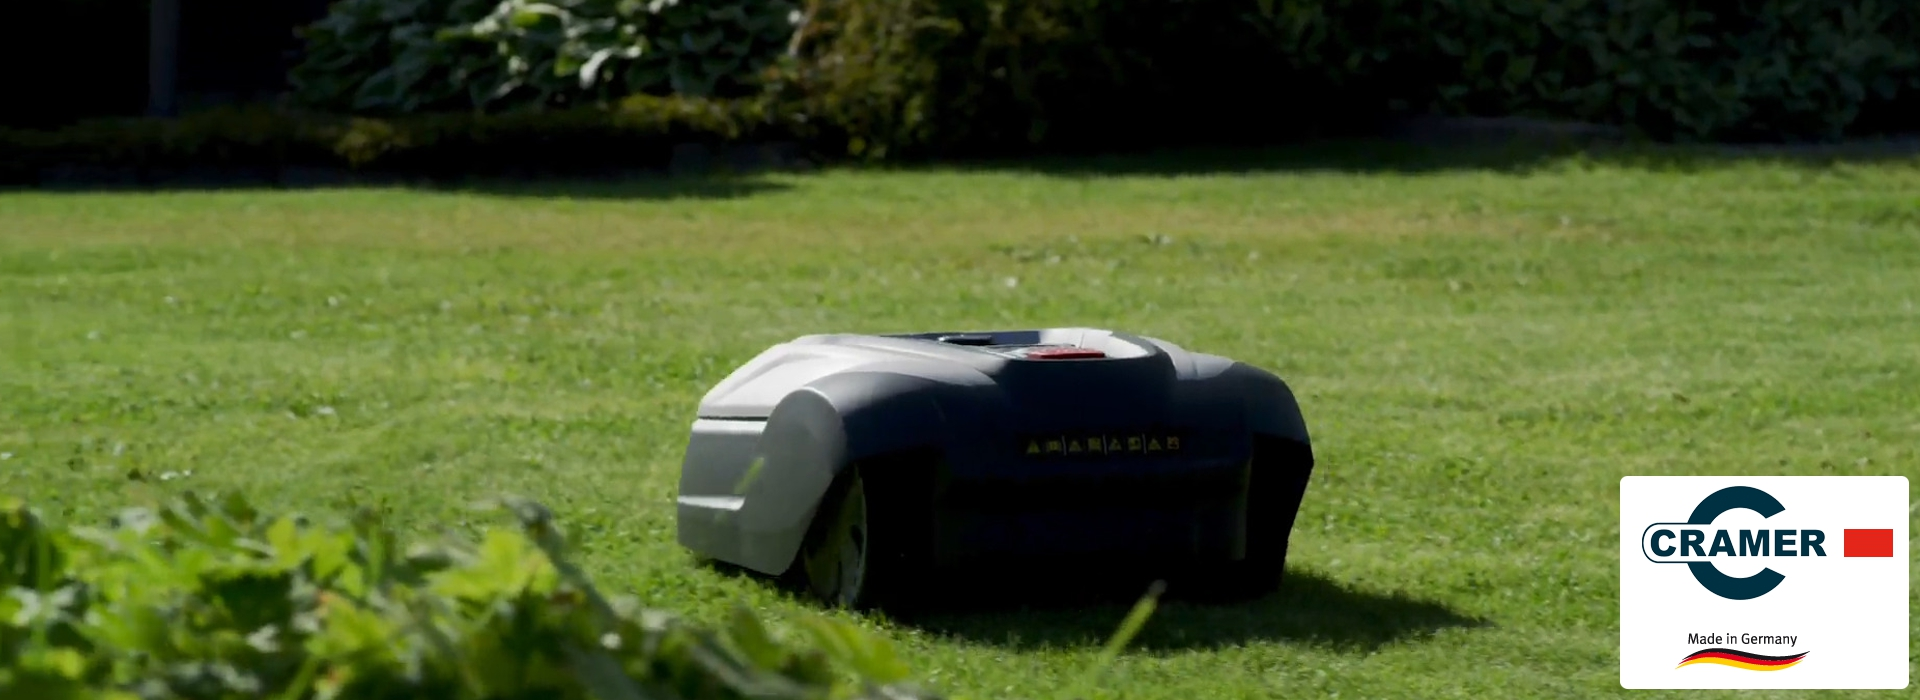 Cramer Roboter